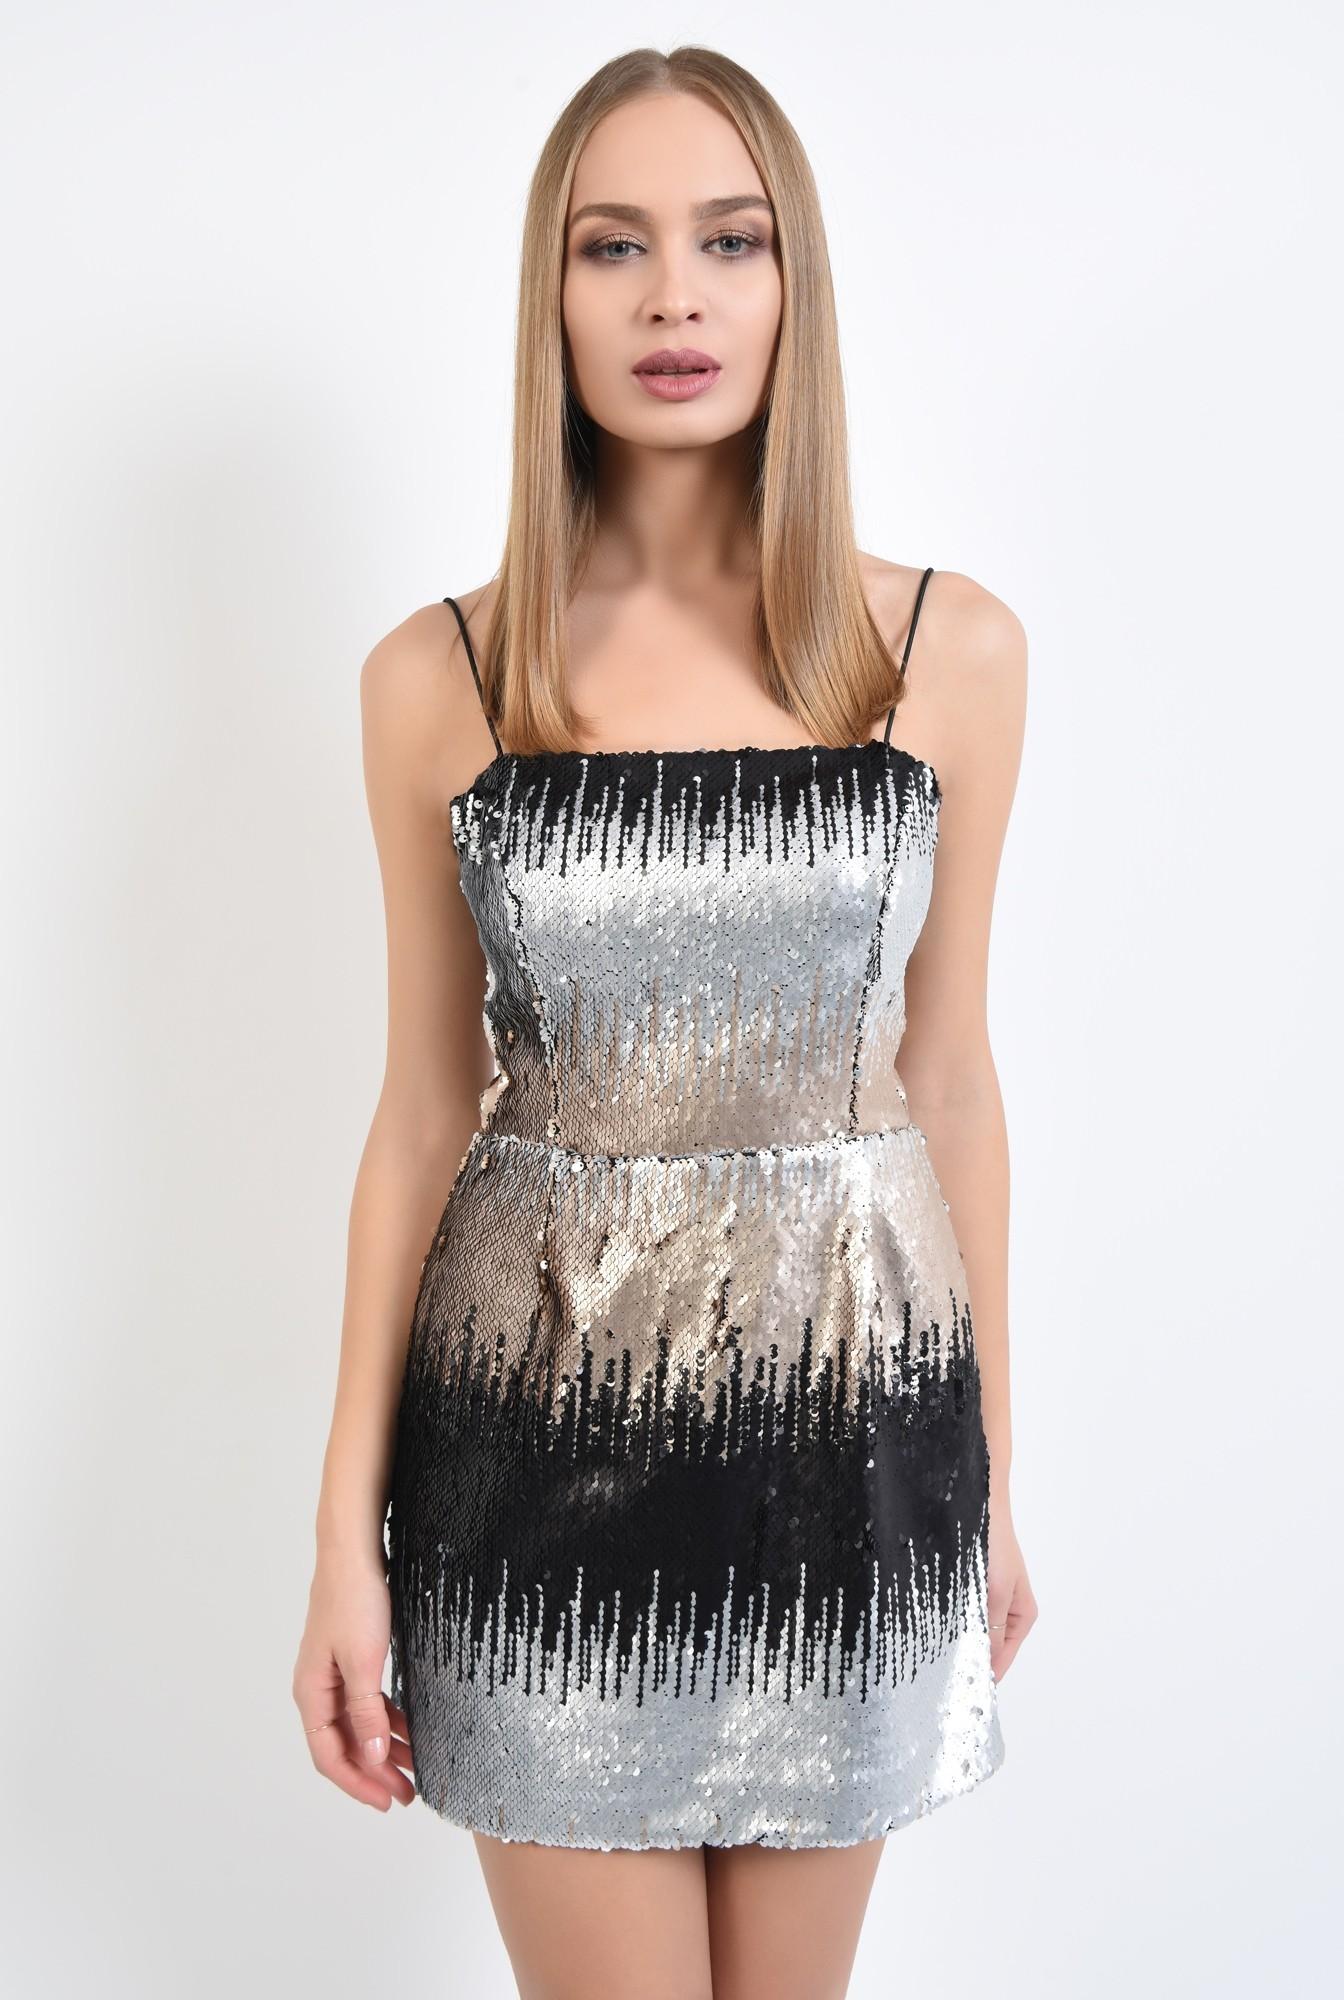 2 - rochie de ocazie, scurta, cu paiete multicolore, bretele subtiri